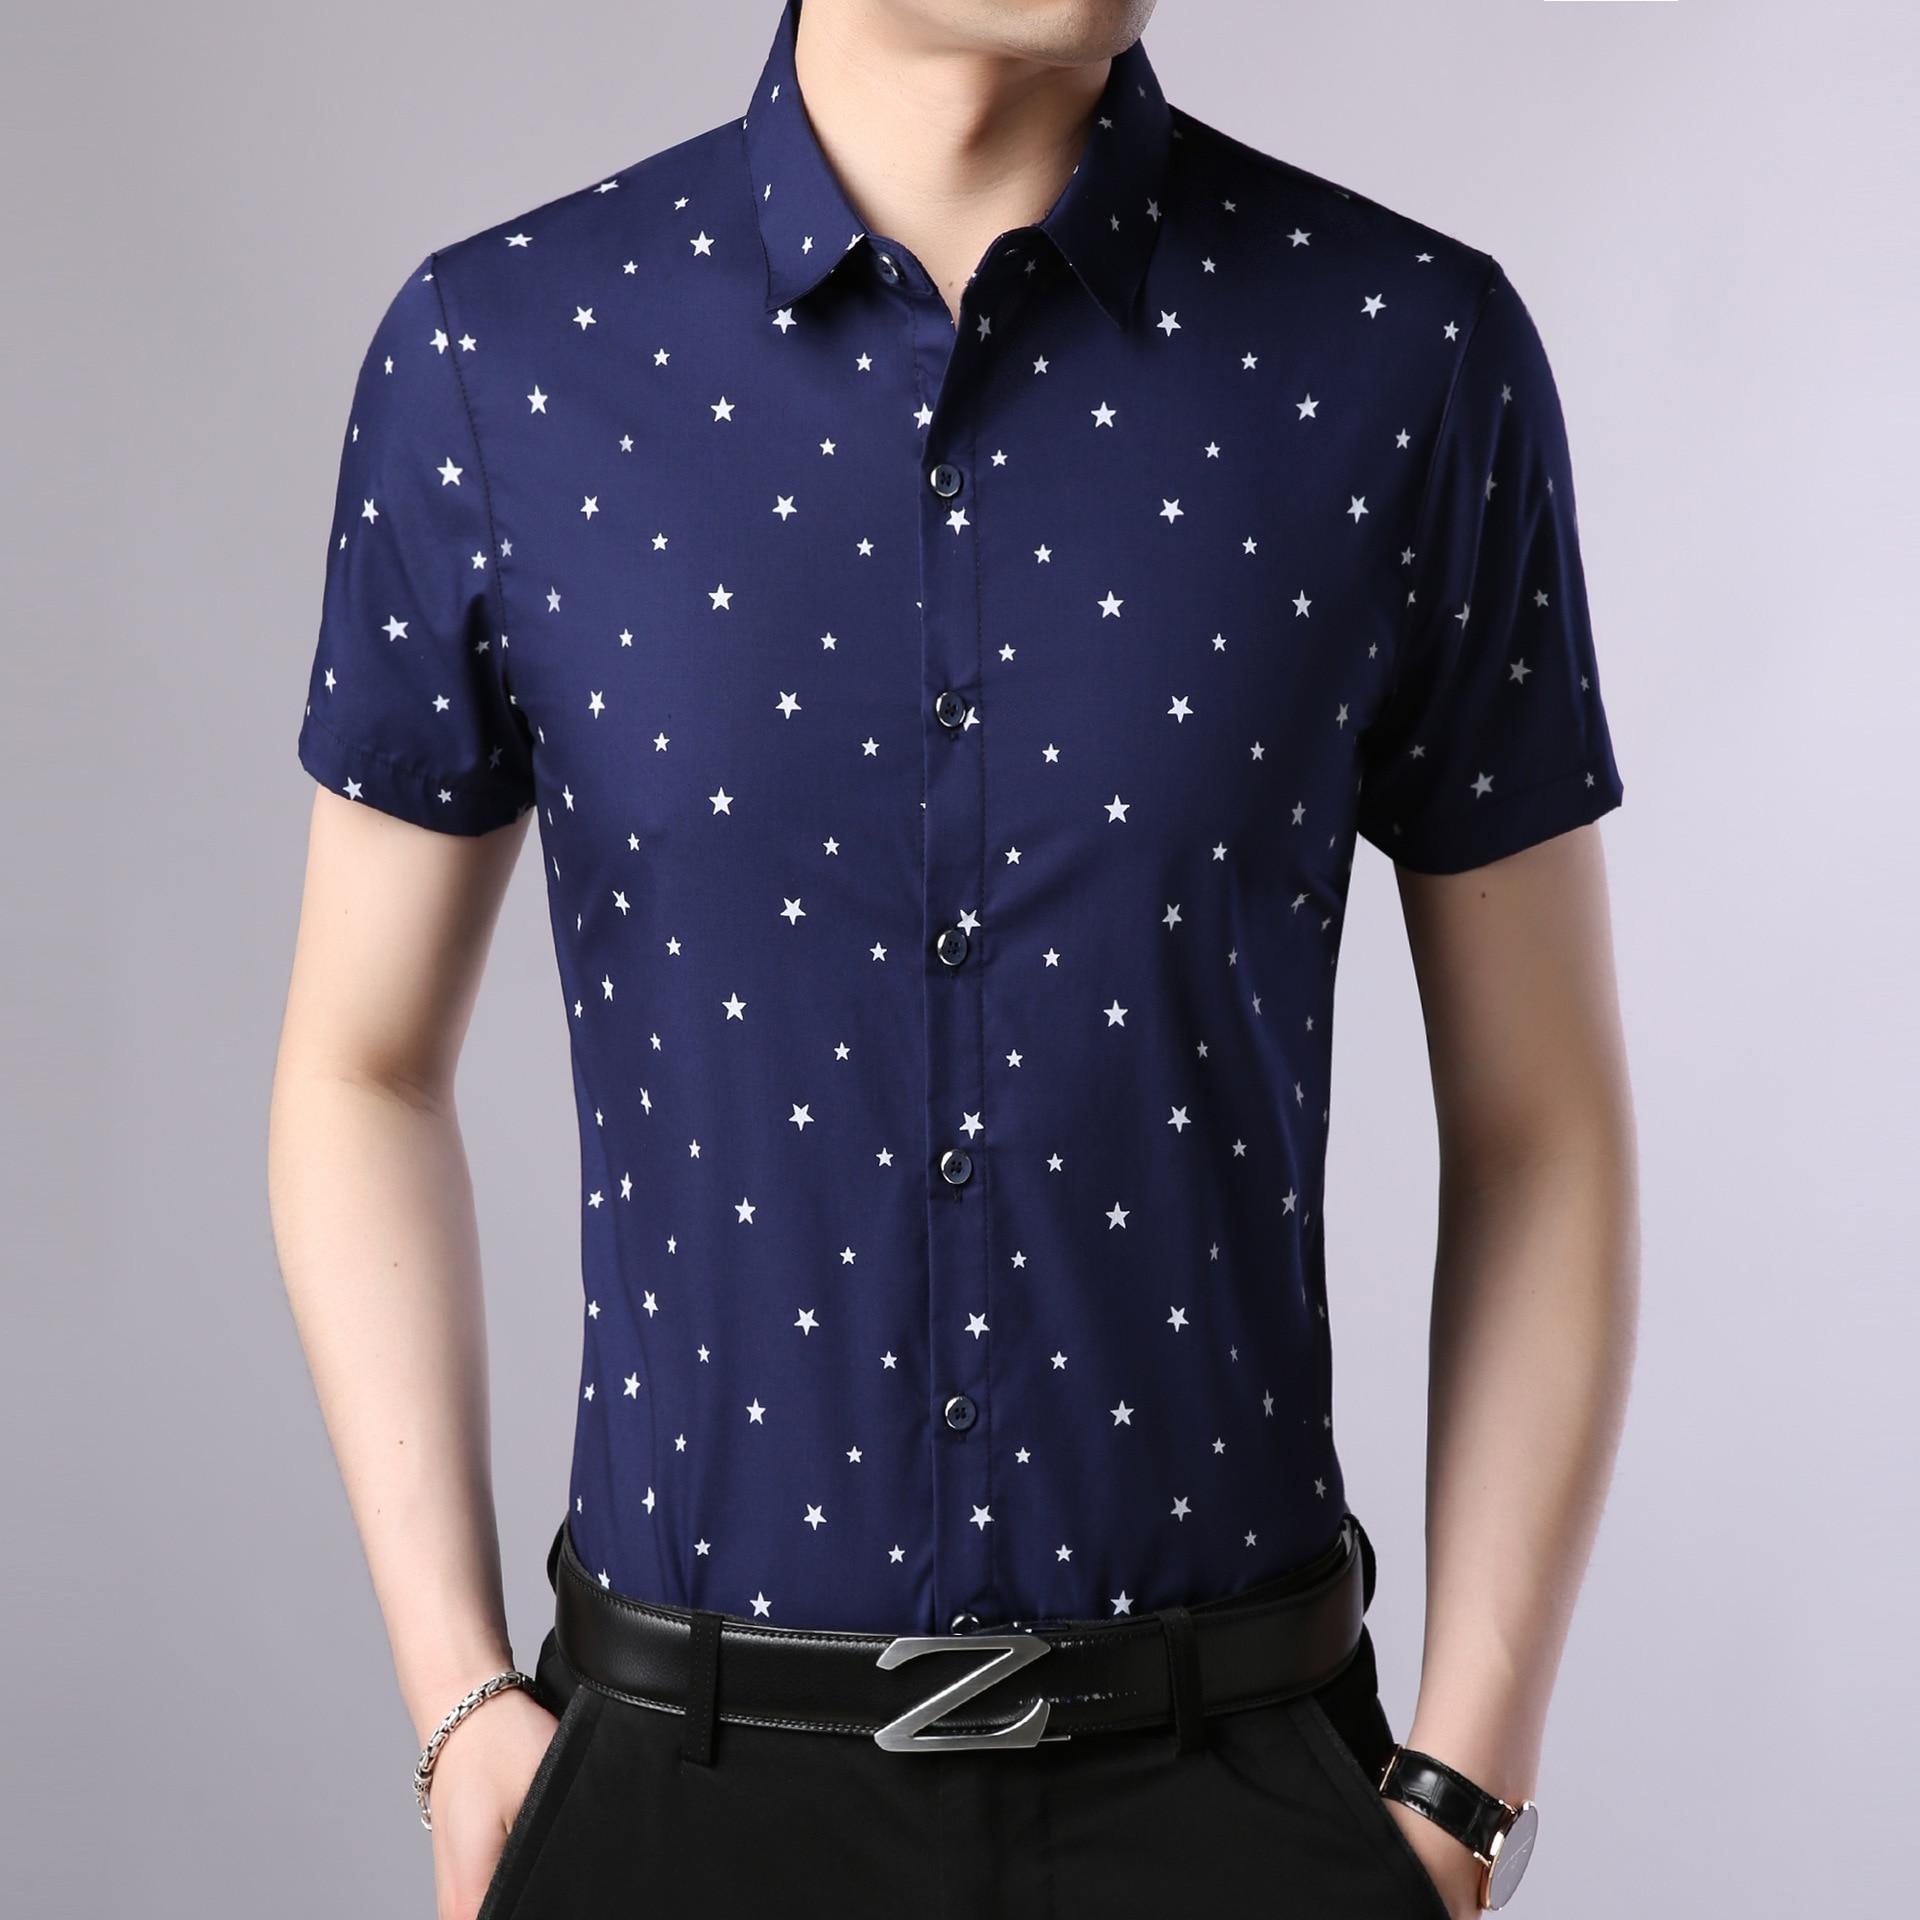 Camisas Para Hombre 2018 Fashion Brand Cotton Blend Mens Shirts Casual Slim Fit Short Sleeve Chemise Homme Star Print Shirt Men